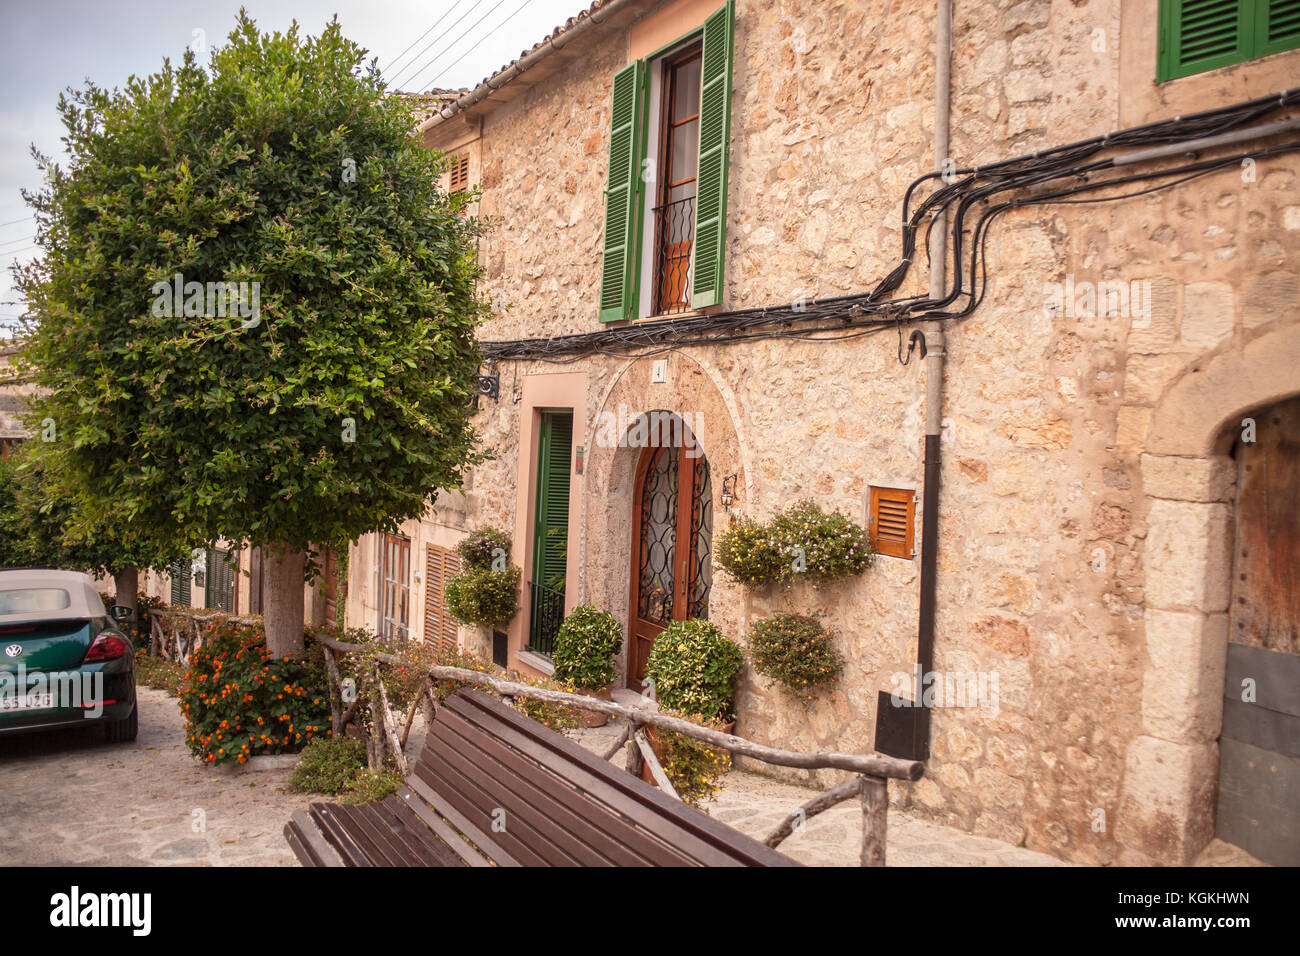 Large tree next to townhouse on street in Valldemossa, Mallorca - Stock Image